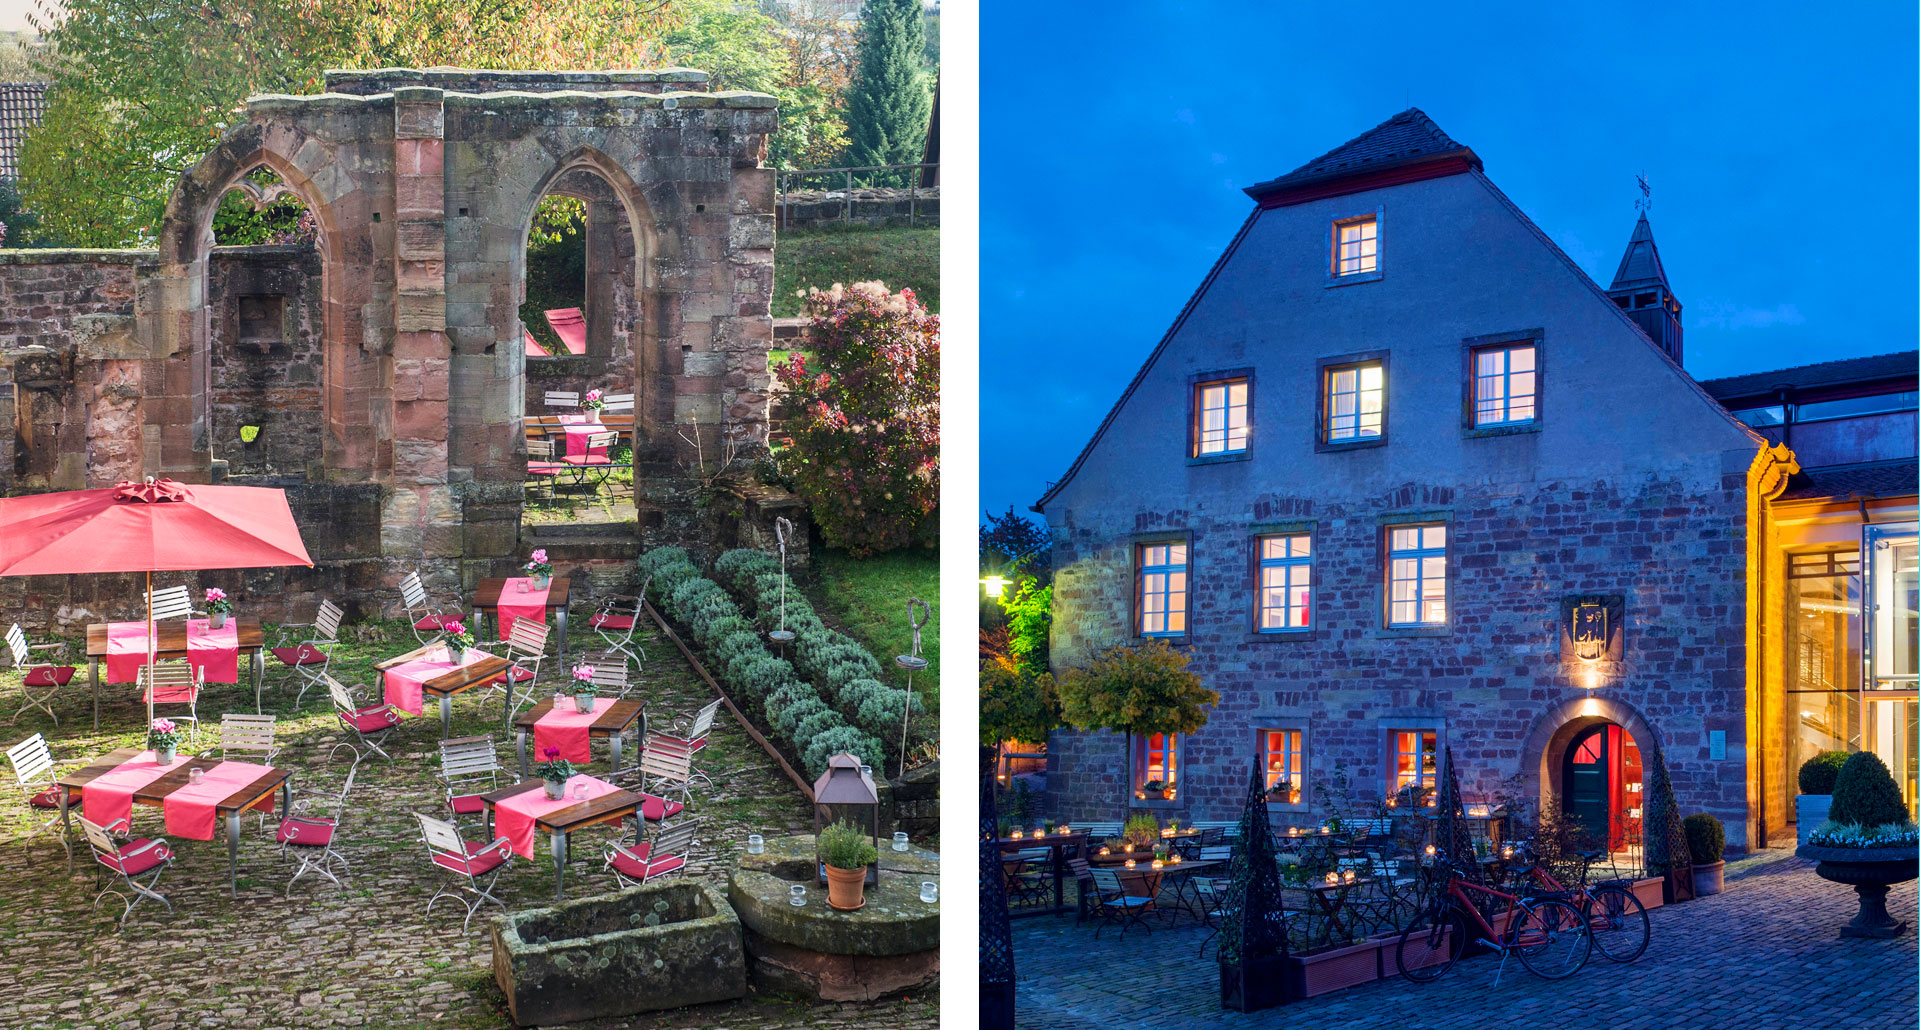 Kloster Hornbach - boutique hotel in Hornbach